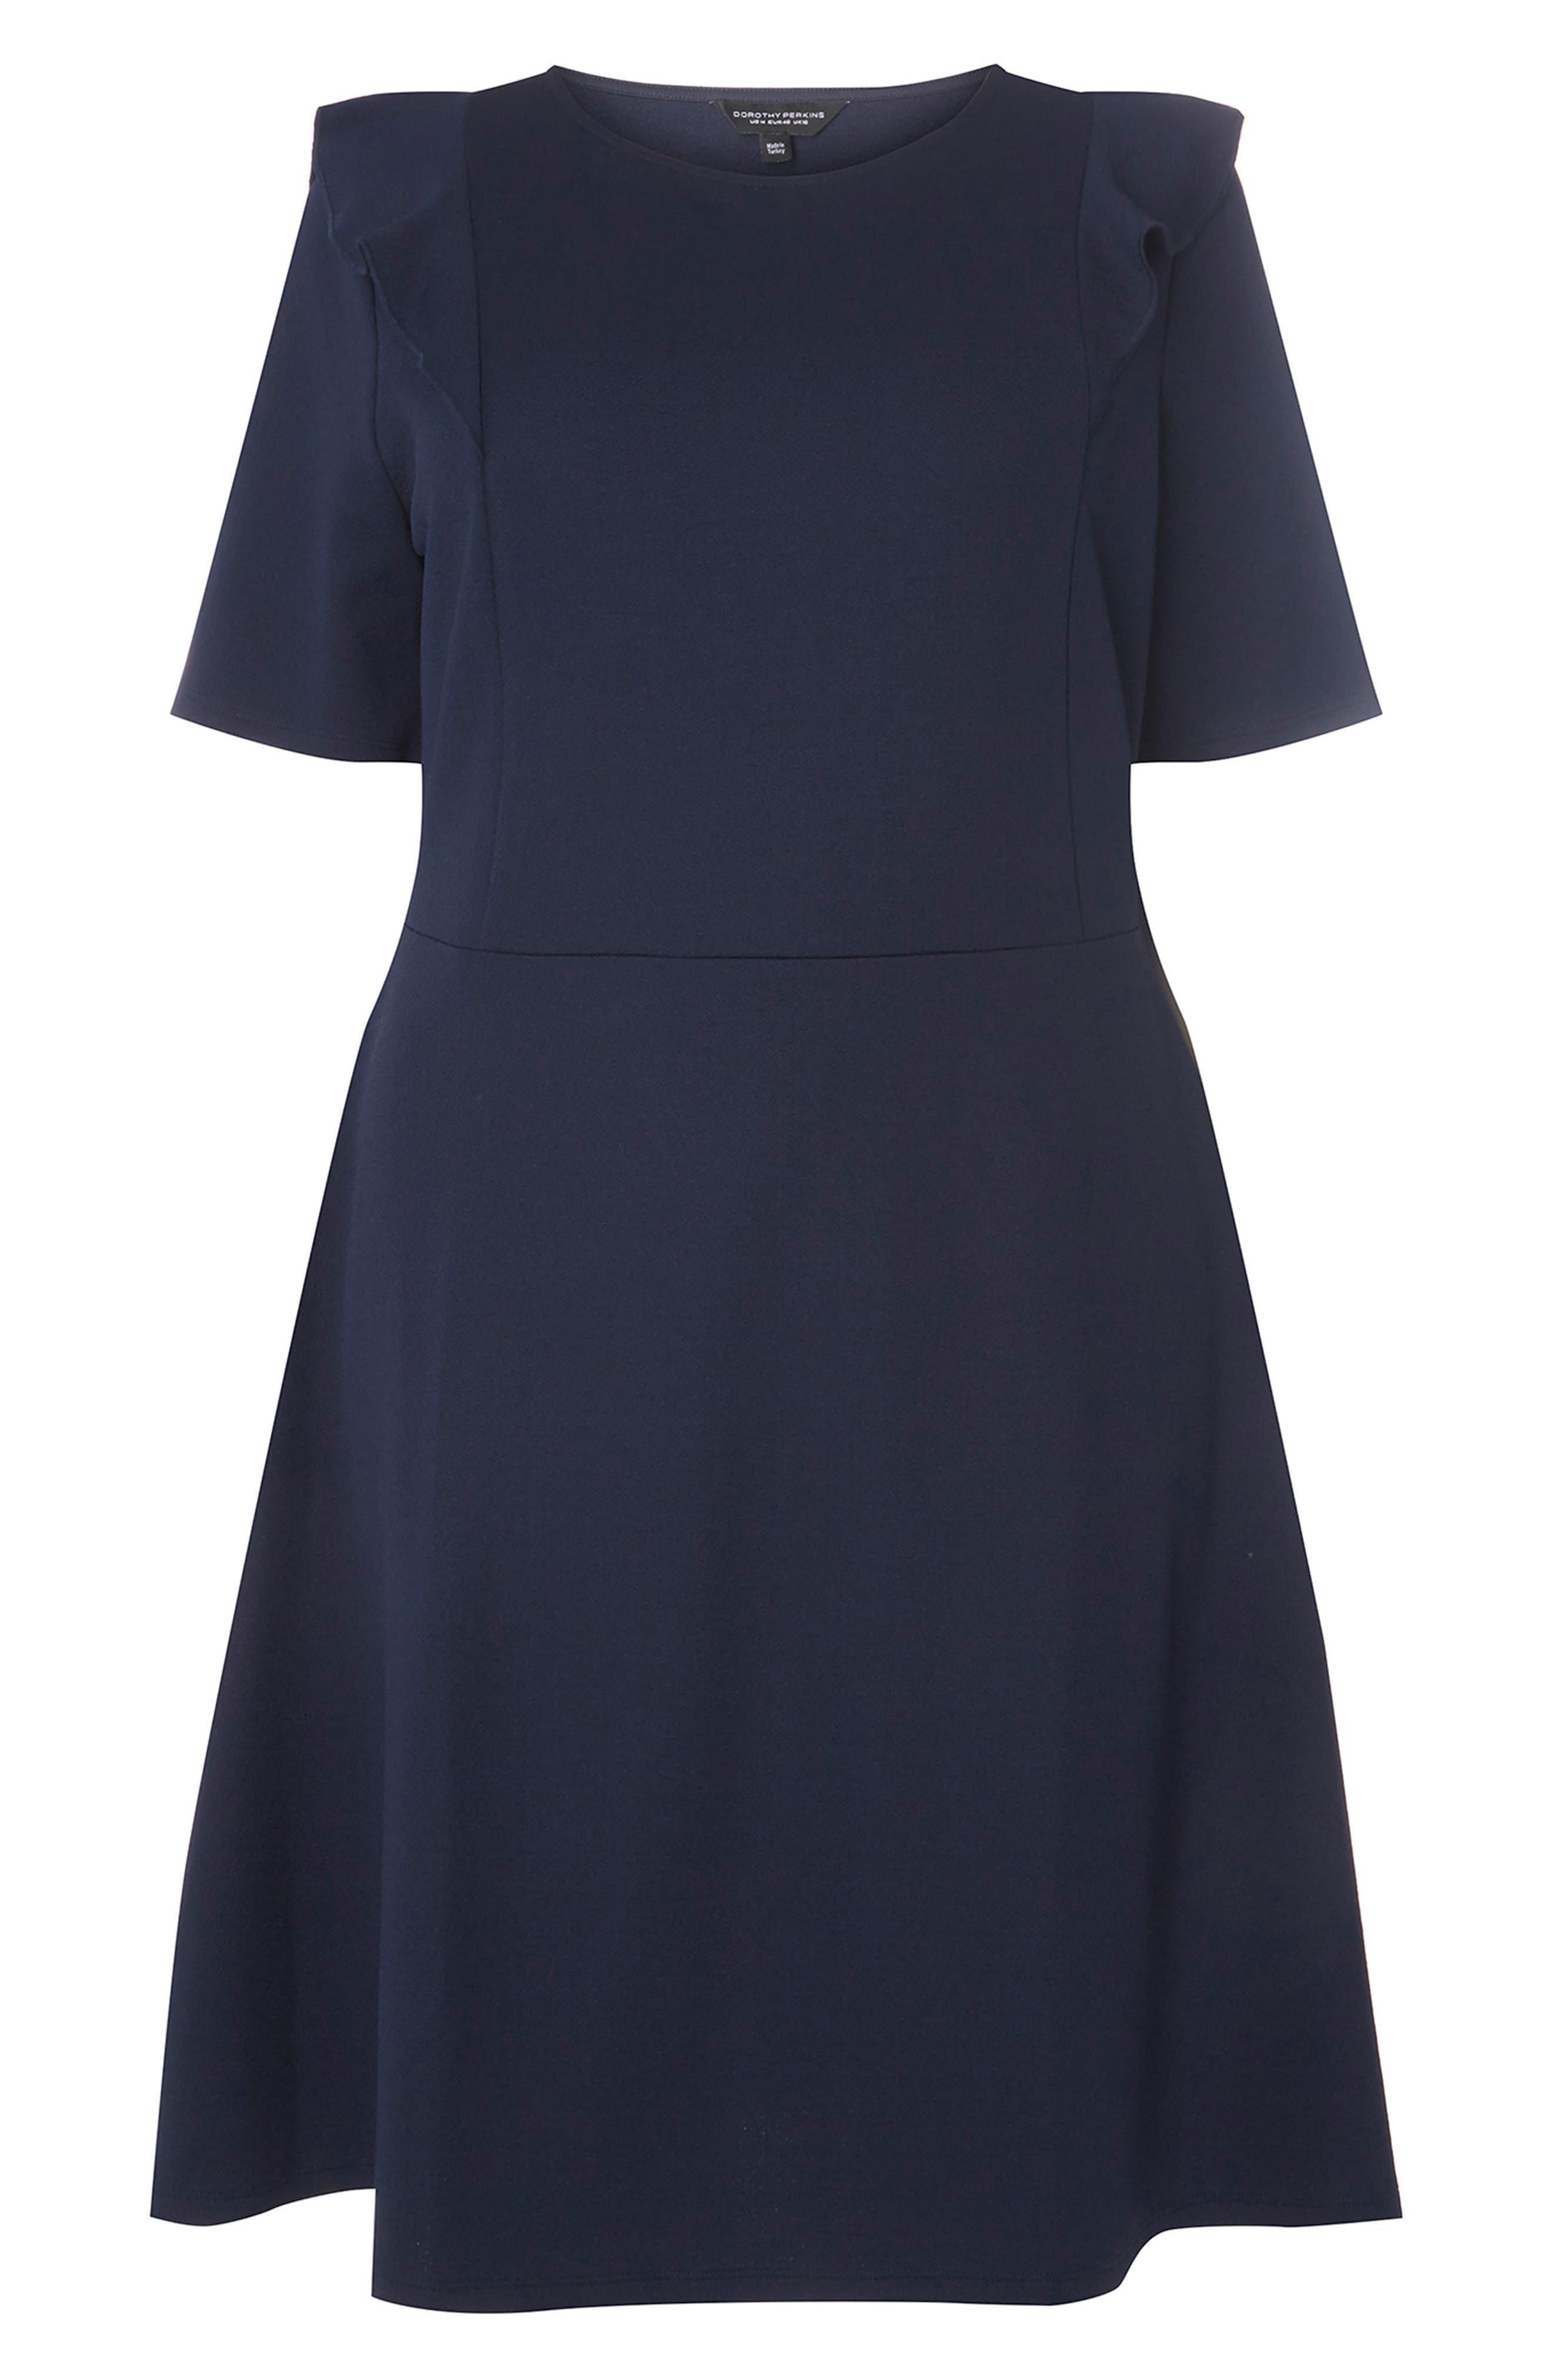 Ruffle Shoulder Knit Dress,                             Alternate thumbnail 4, color,                             Navy